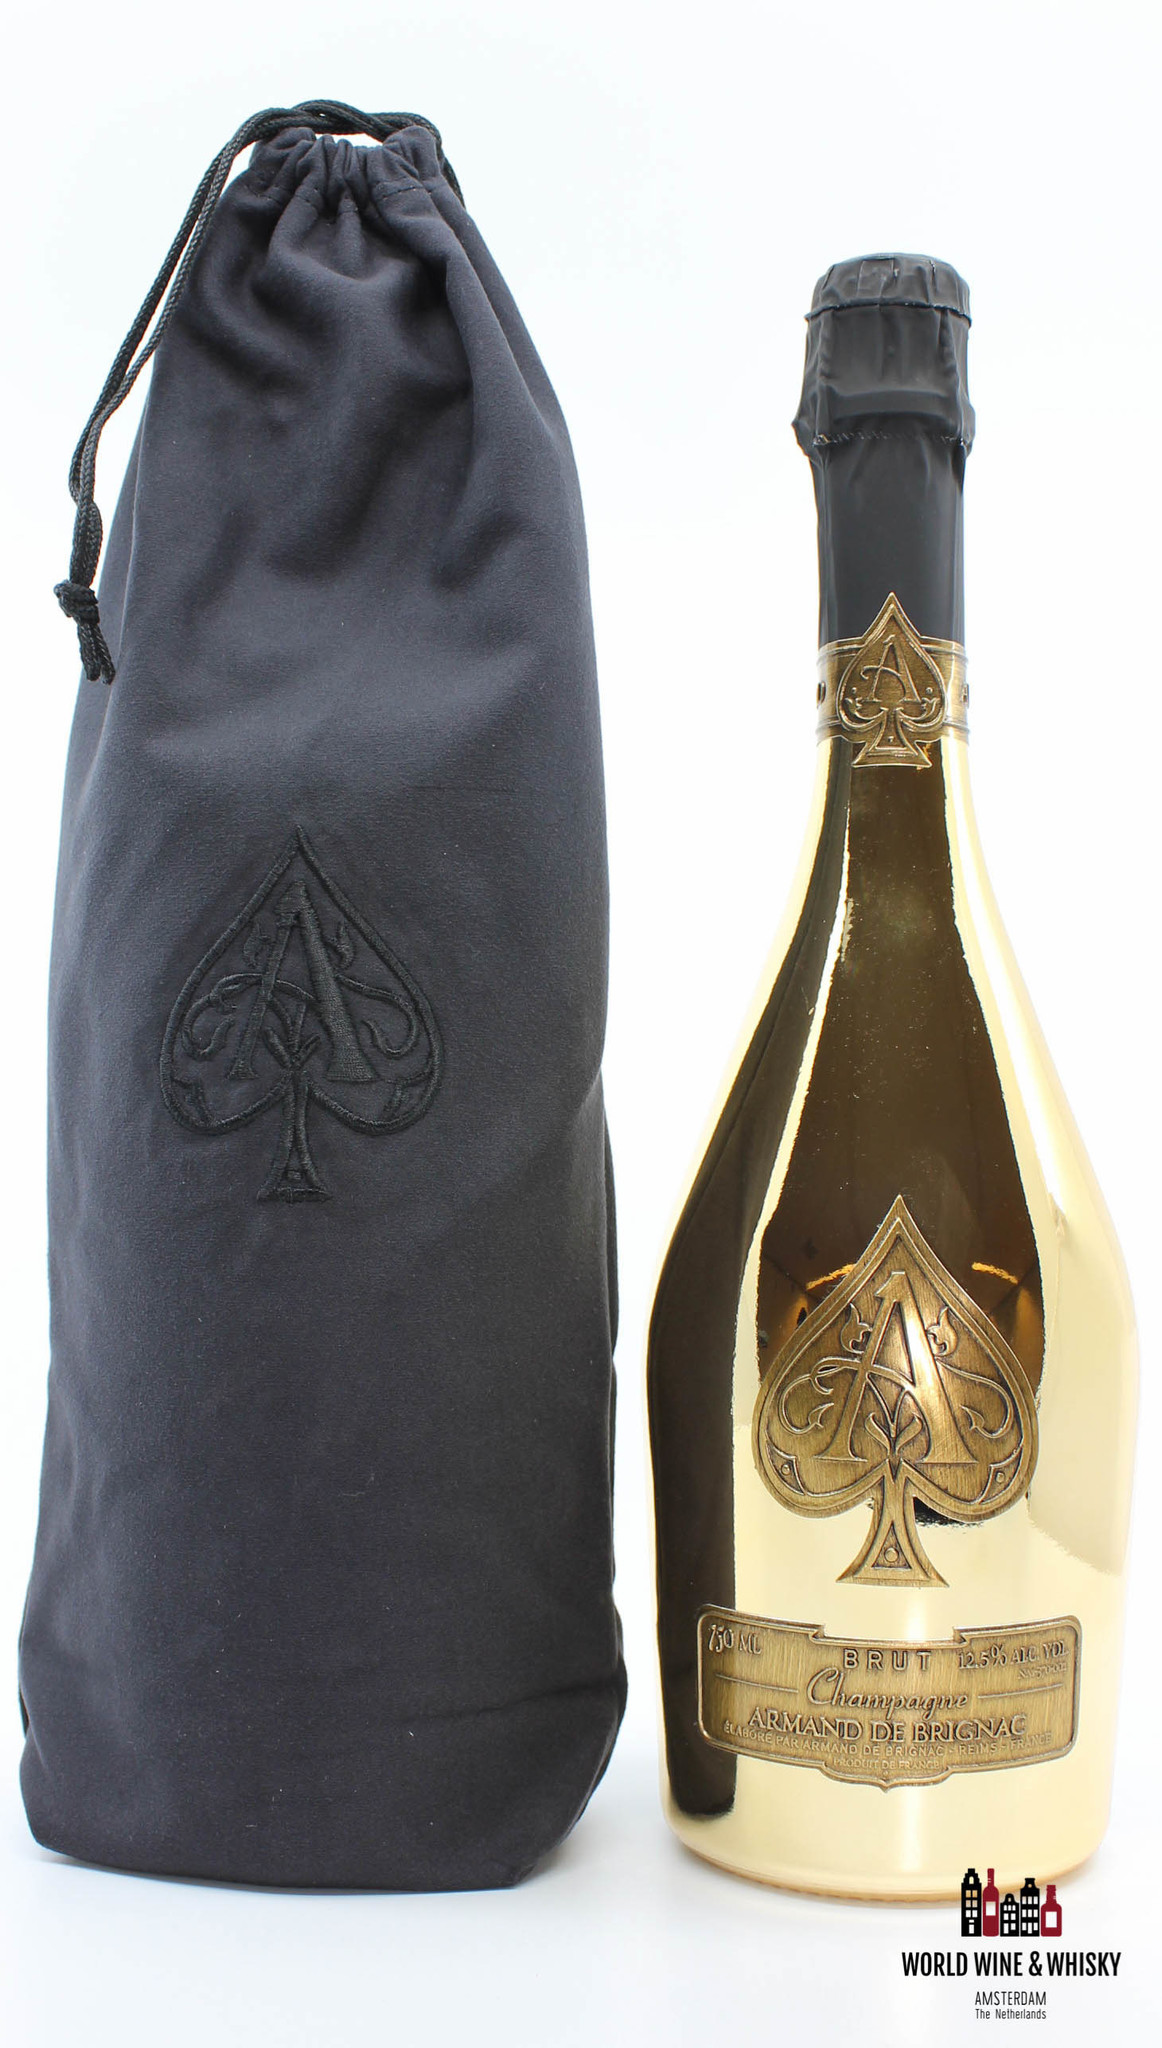 Armand de Brignac Armand de Brignac Gold Champagne Brut 12.5% - in velvet bag (750 ml)